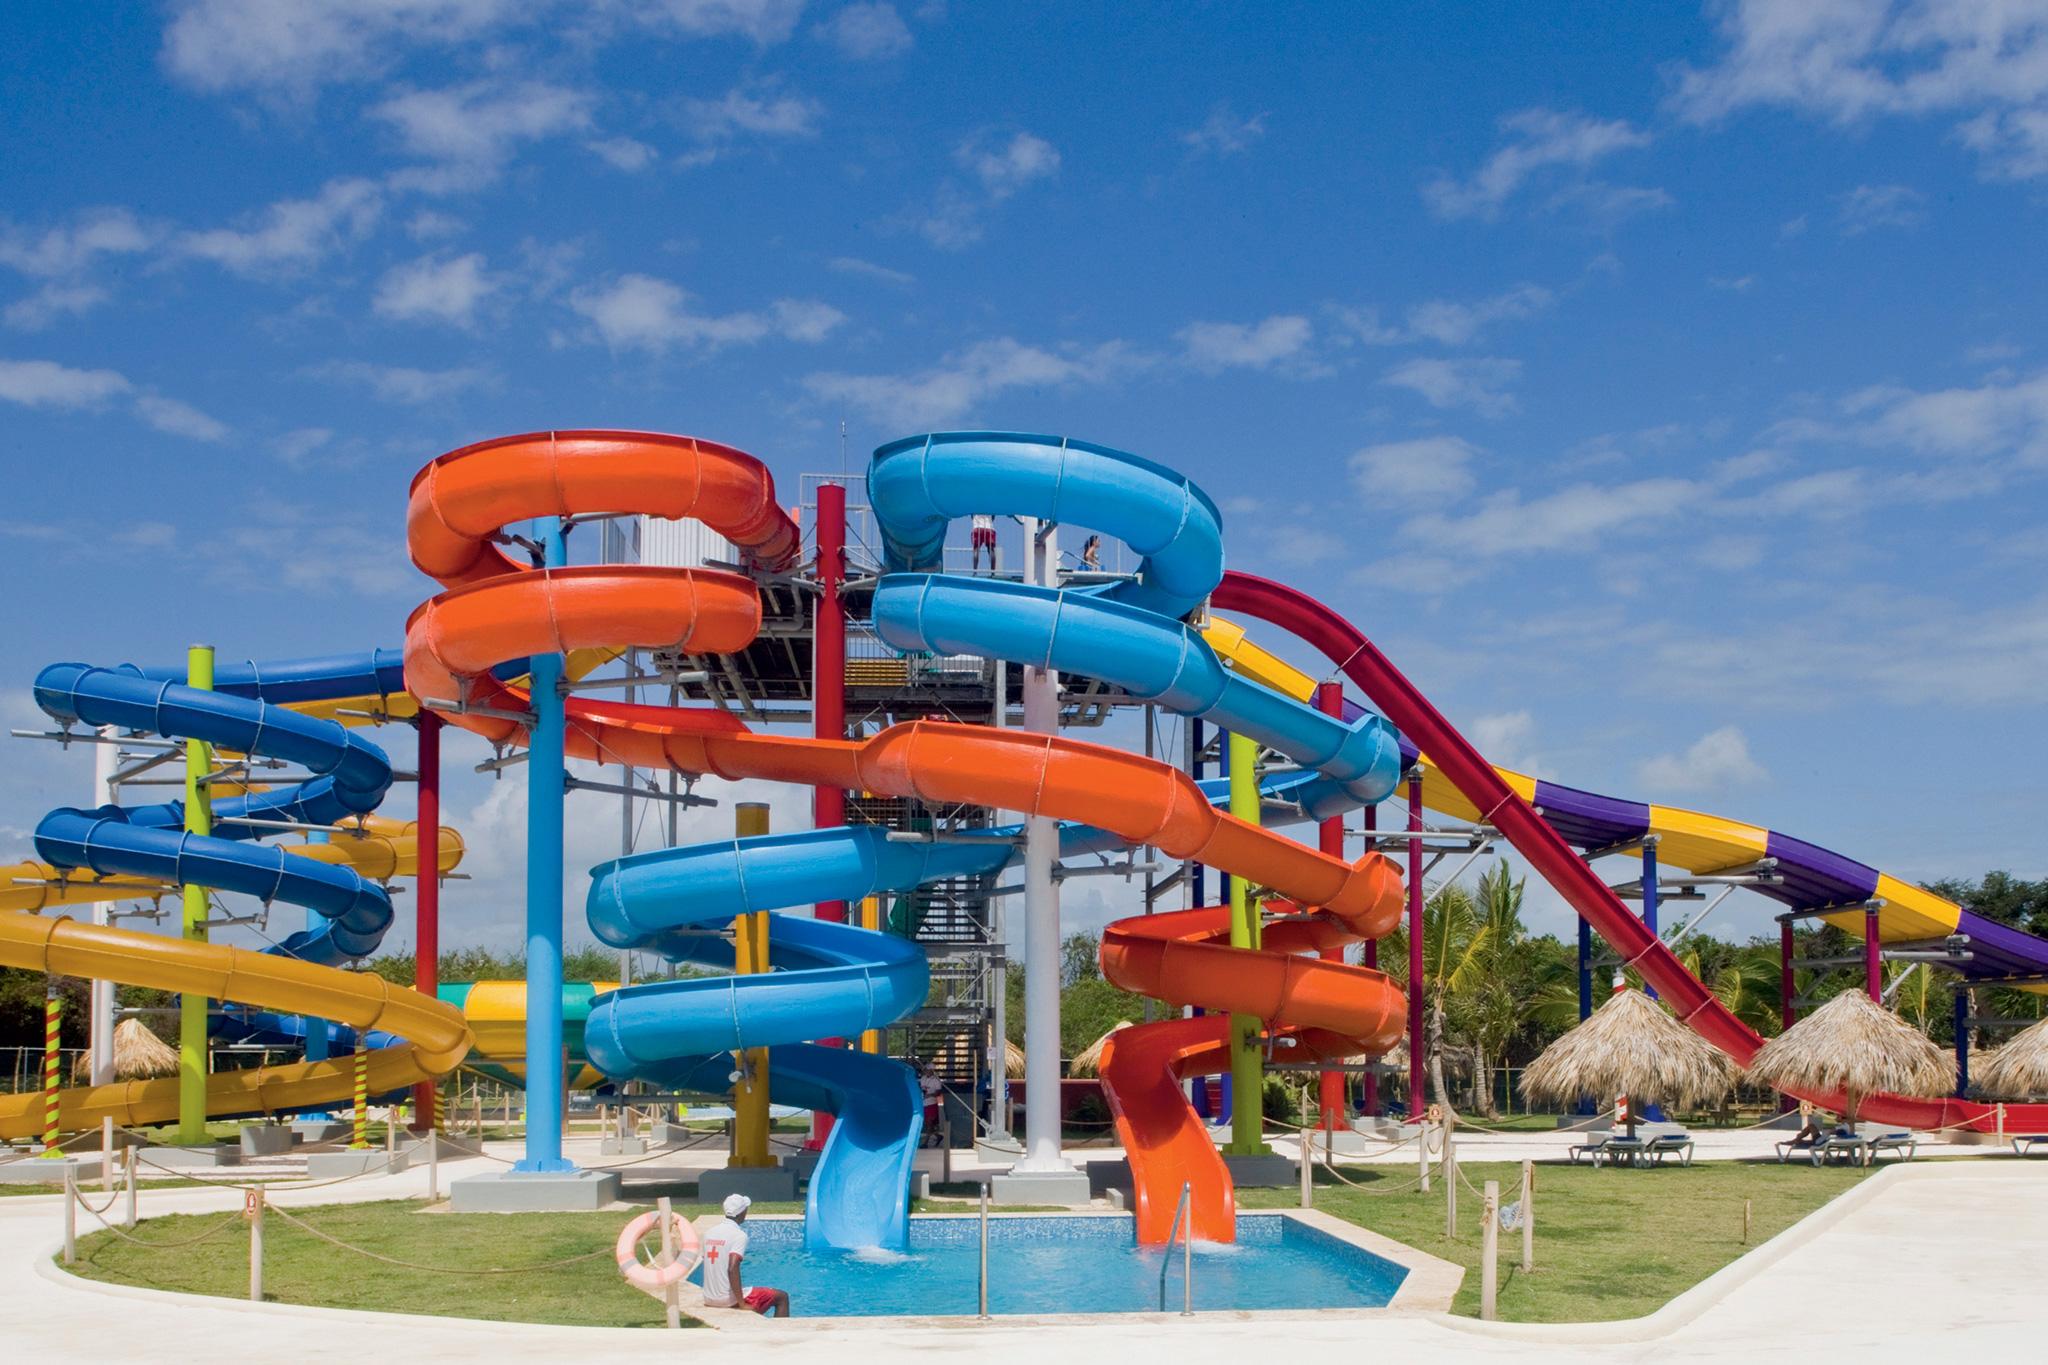 Sirenis tropical suites casino & aquagames punta cana reviews motor city casino in detroit michigan